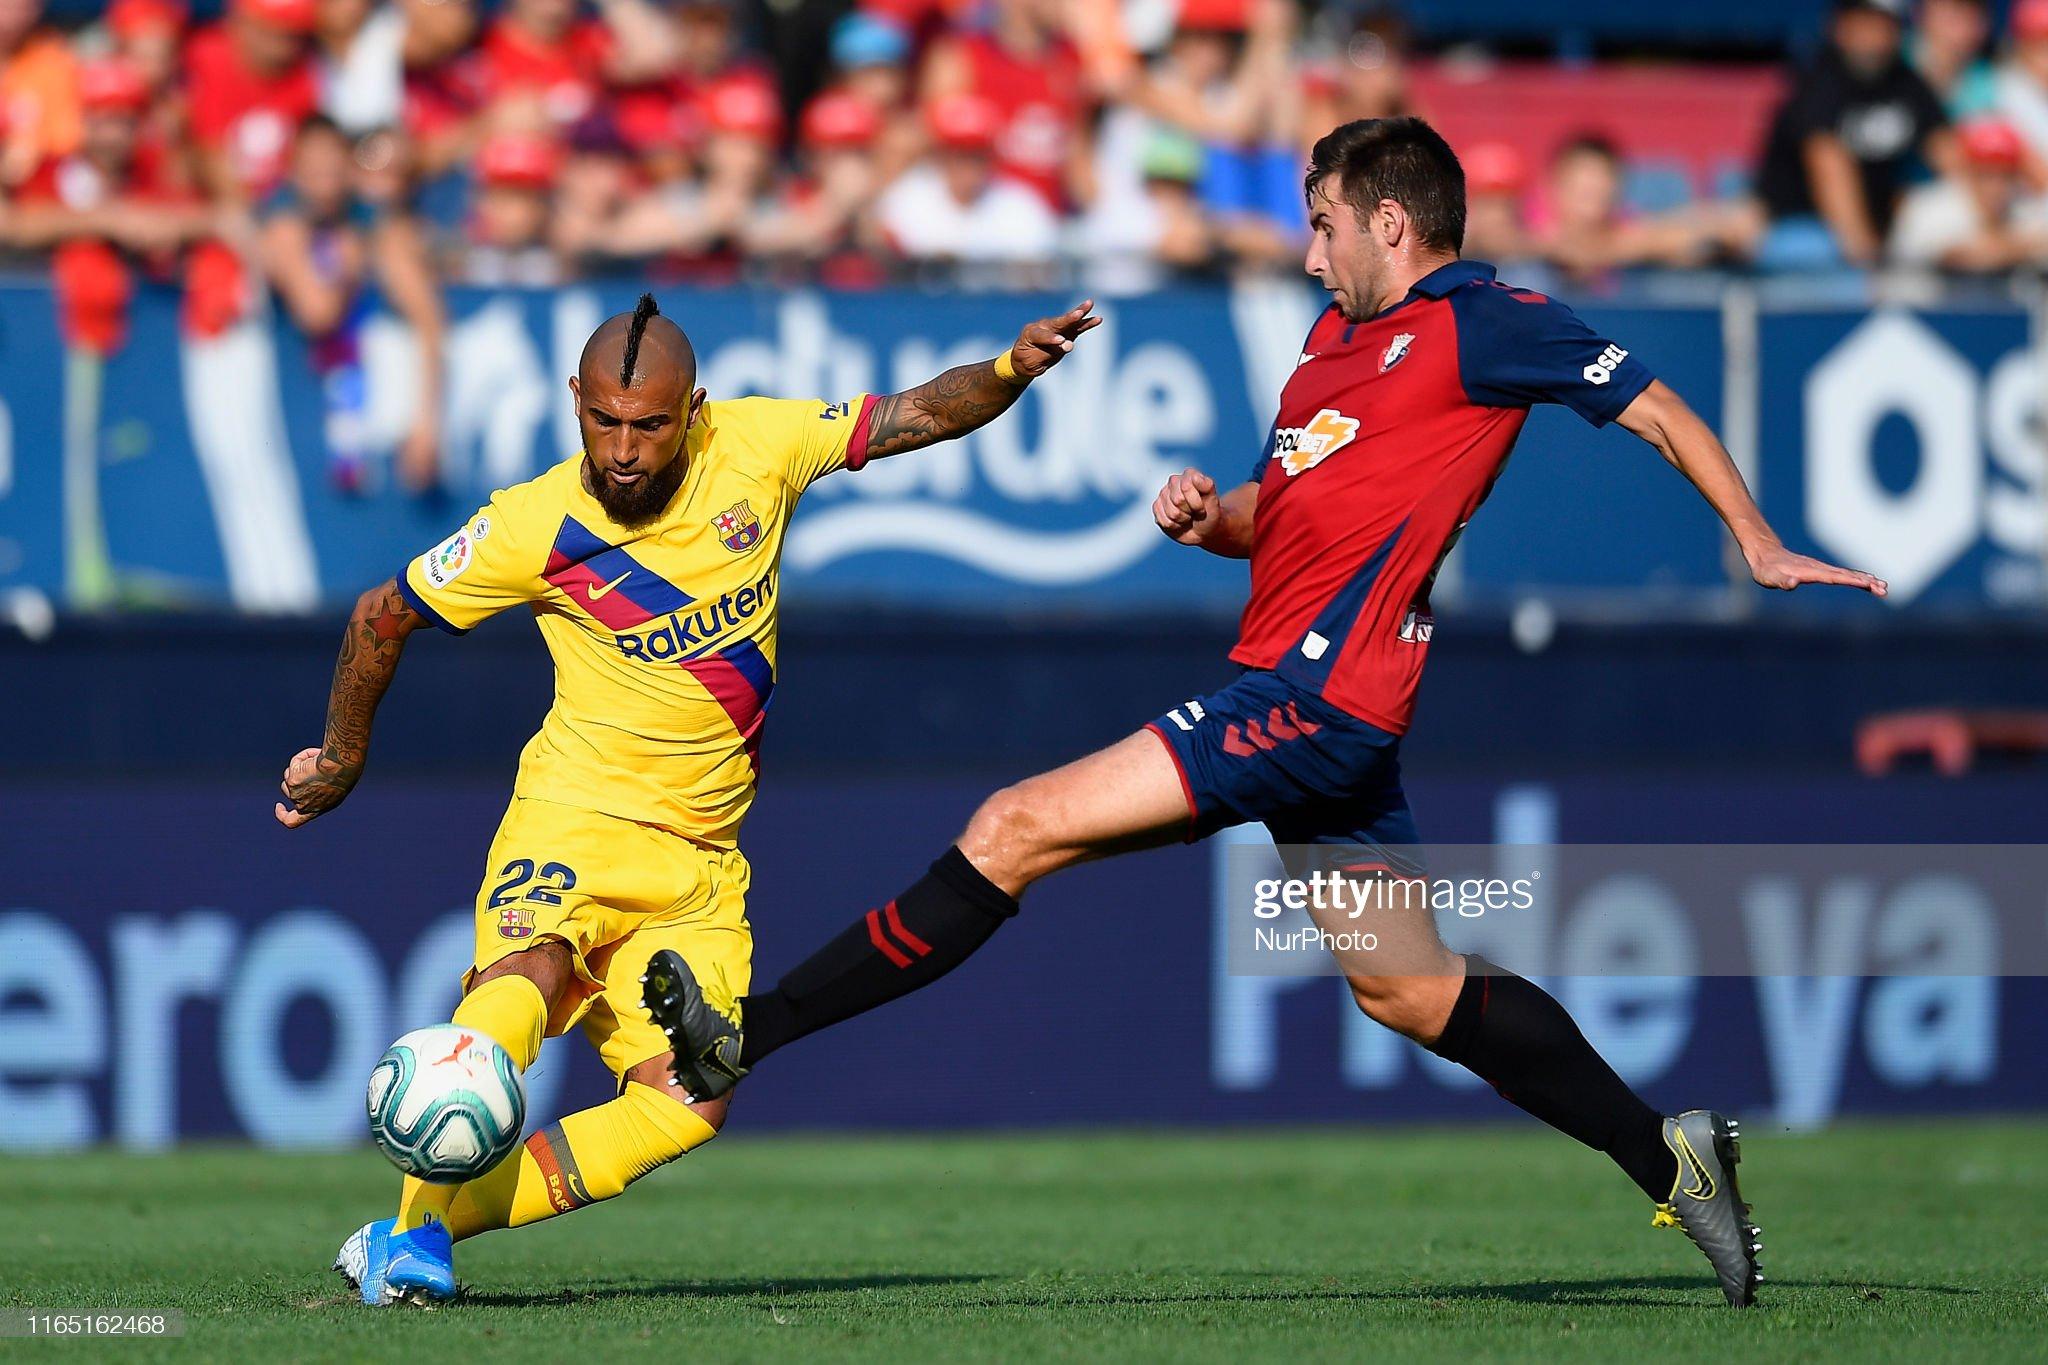 صور مباراة : أوساسونا - برشلونة 2-2 ( 31-08-2019 )  Arturo-vidal-of-barcelona-shooting-to-goal-during-the-liga-match-ca-picture-id1165162468?s=2048x2048